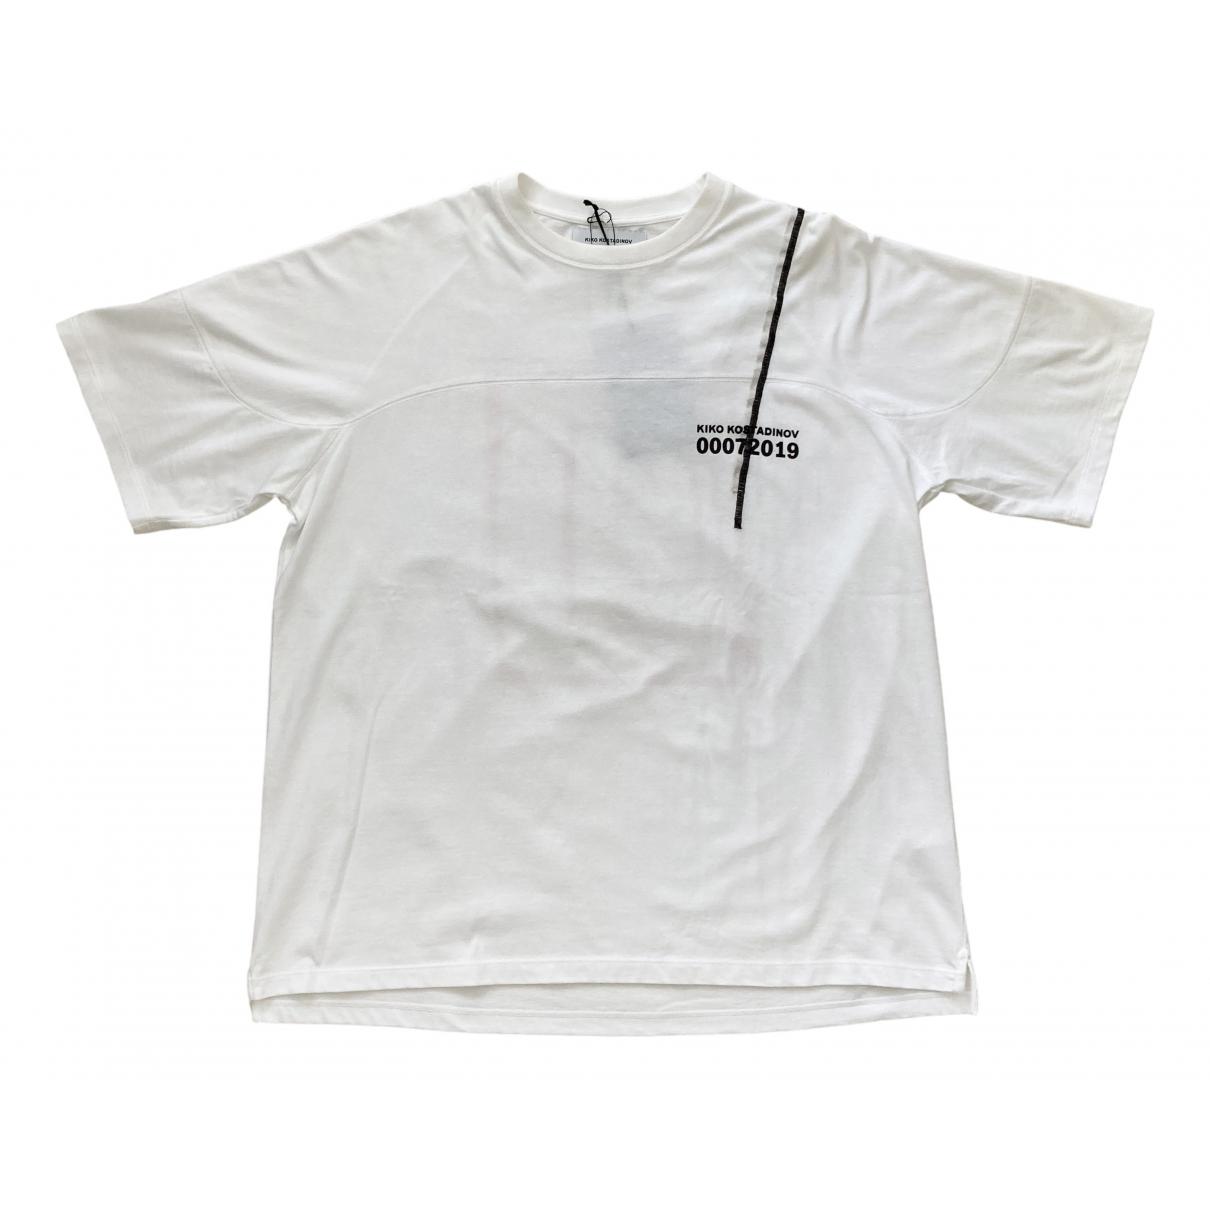 Kiko Kostadinov \N White Cotton T-shirts for Men M International